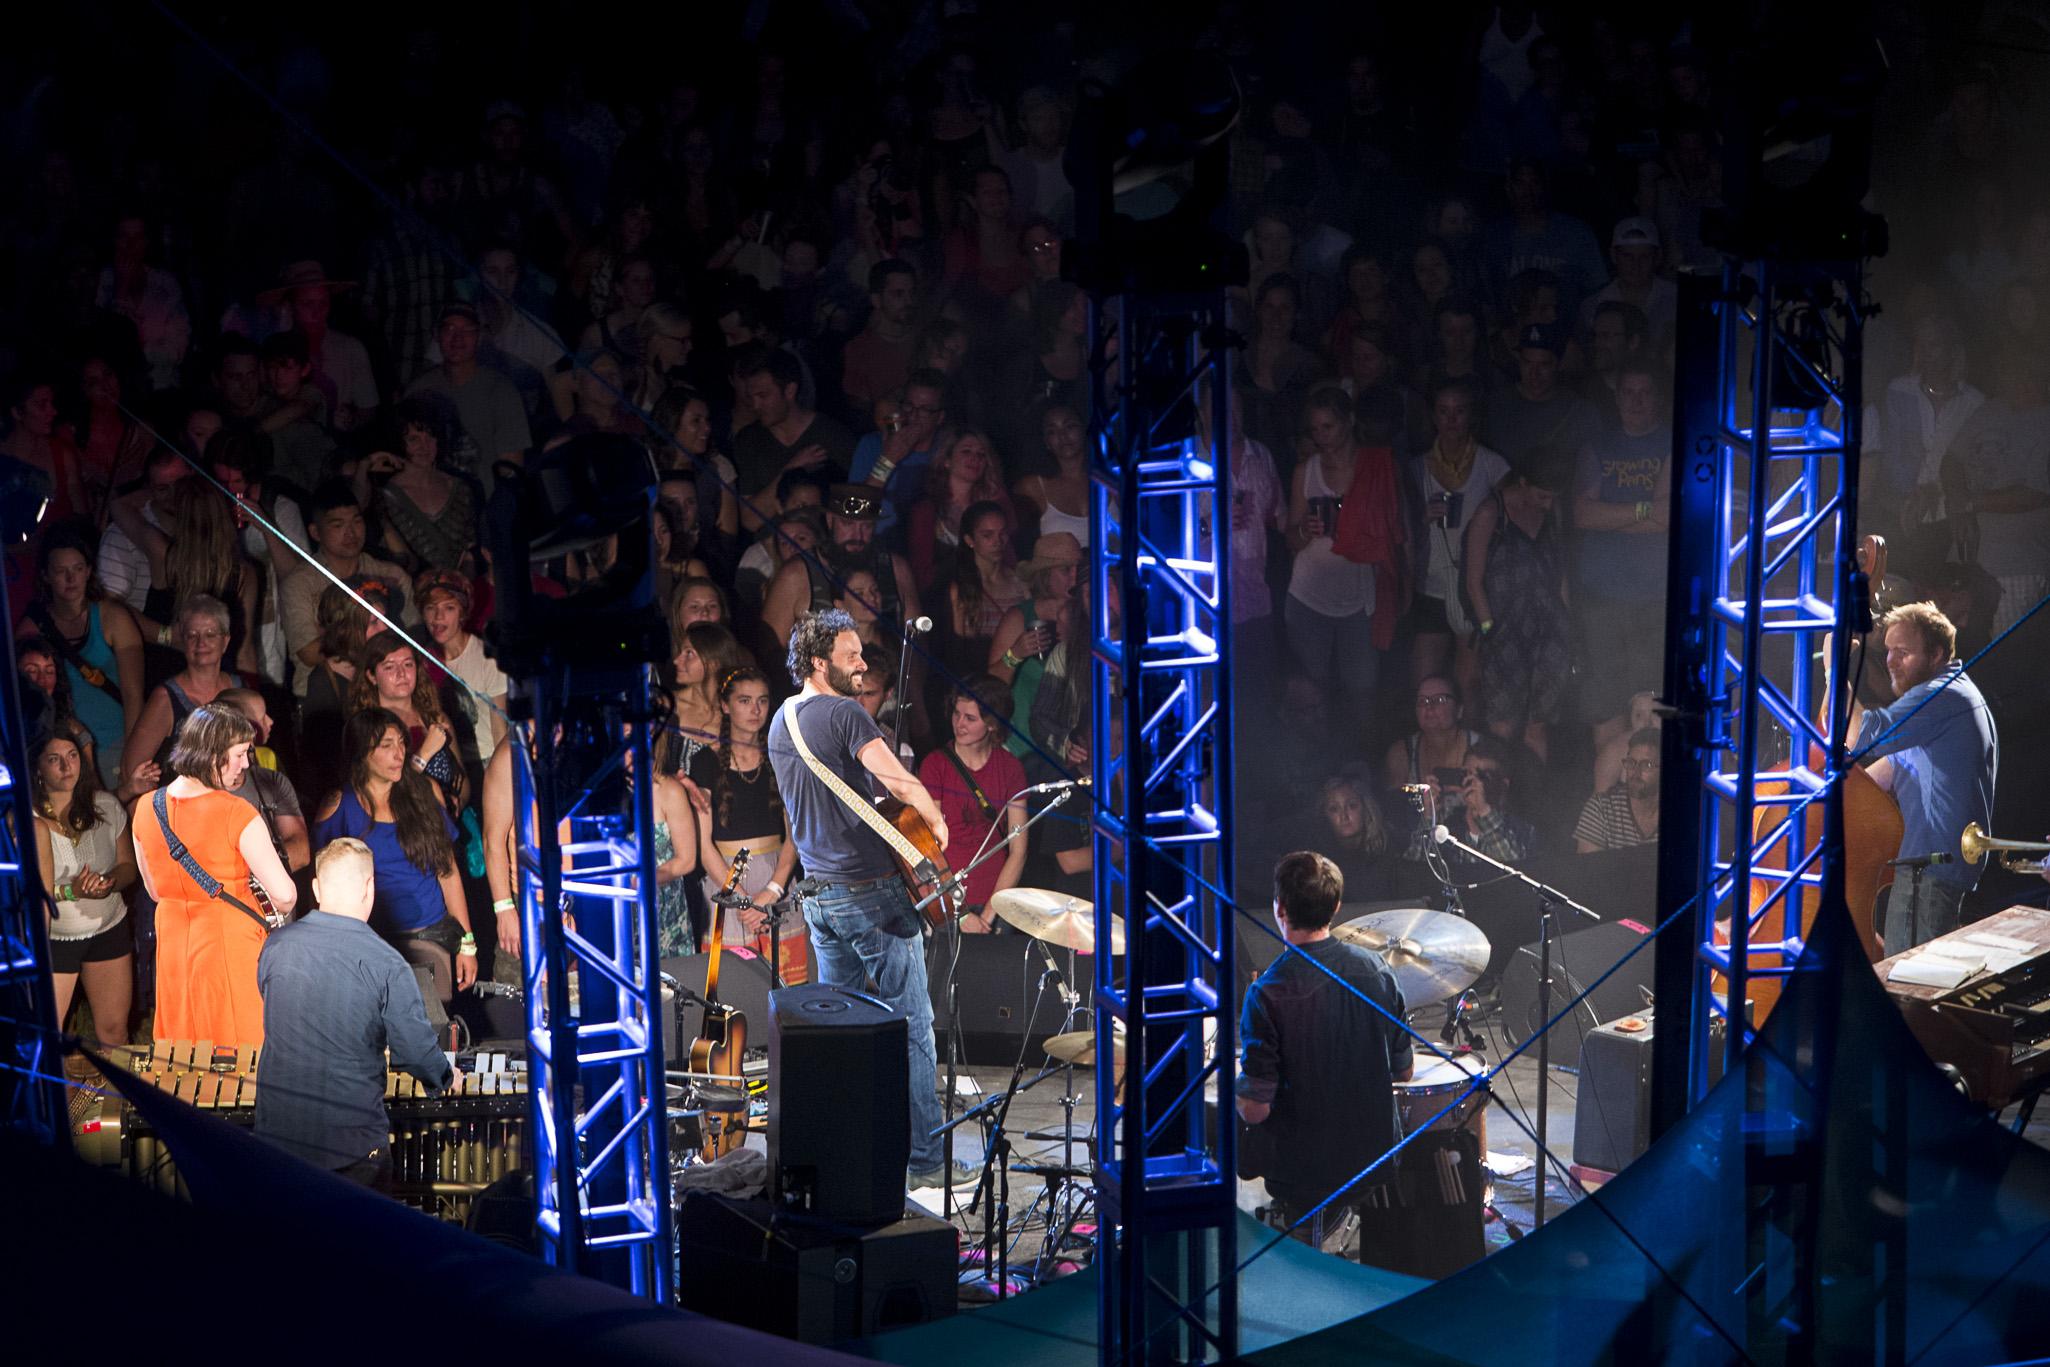 Pickathon 2014, live music festival